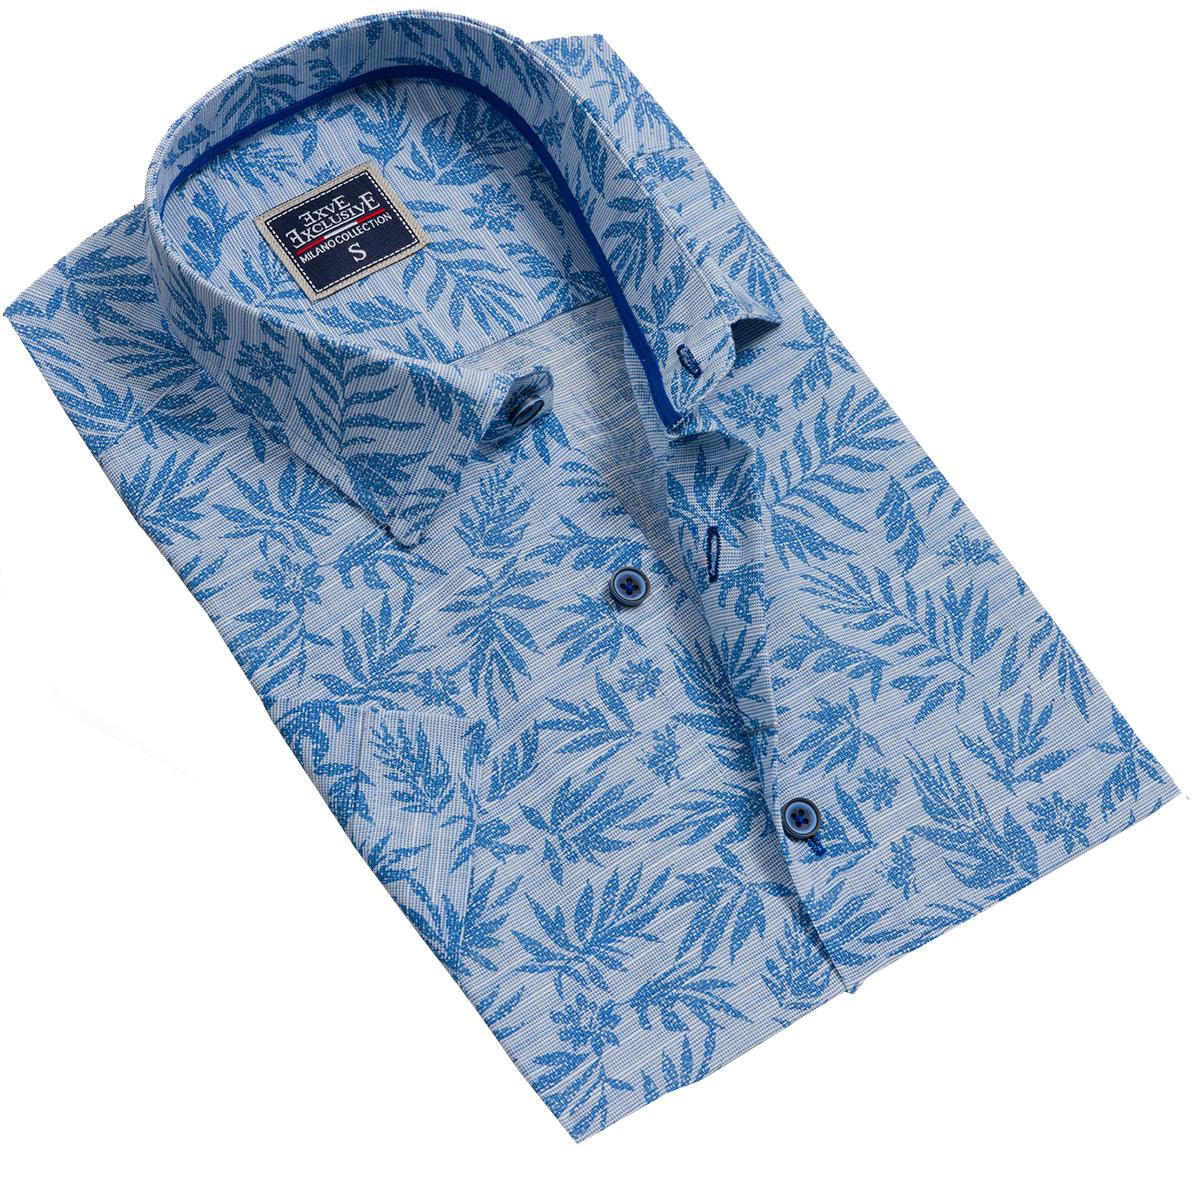 Short Sleeves Hawaii Men's Shirt Collection